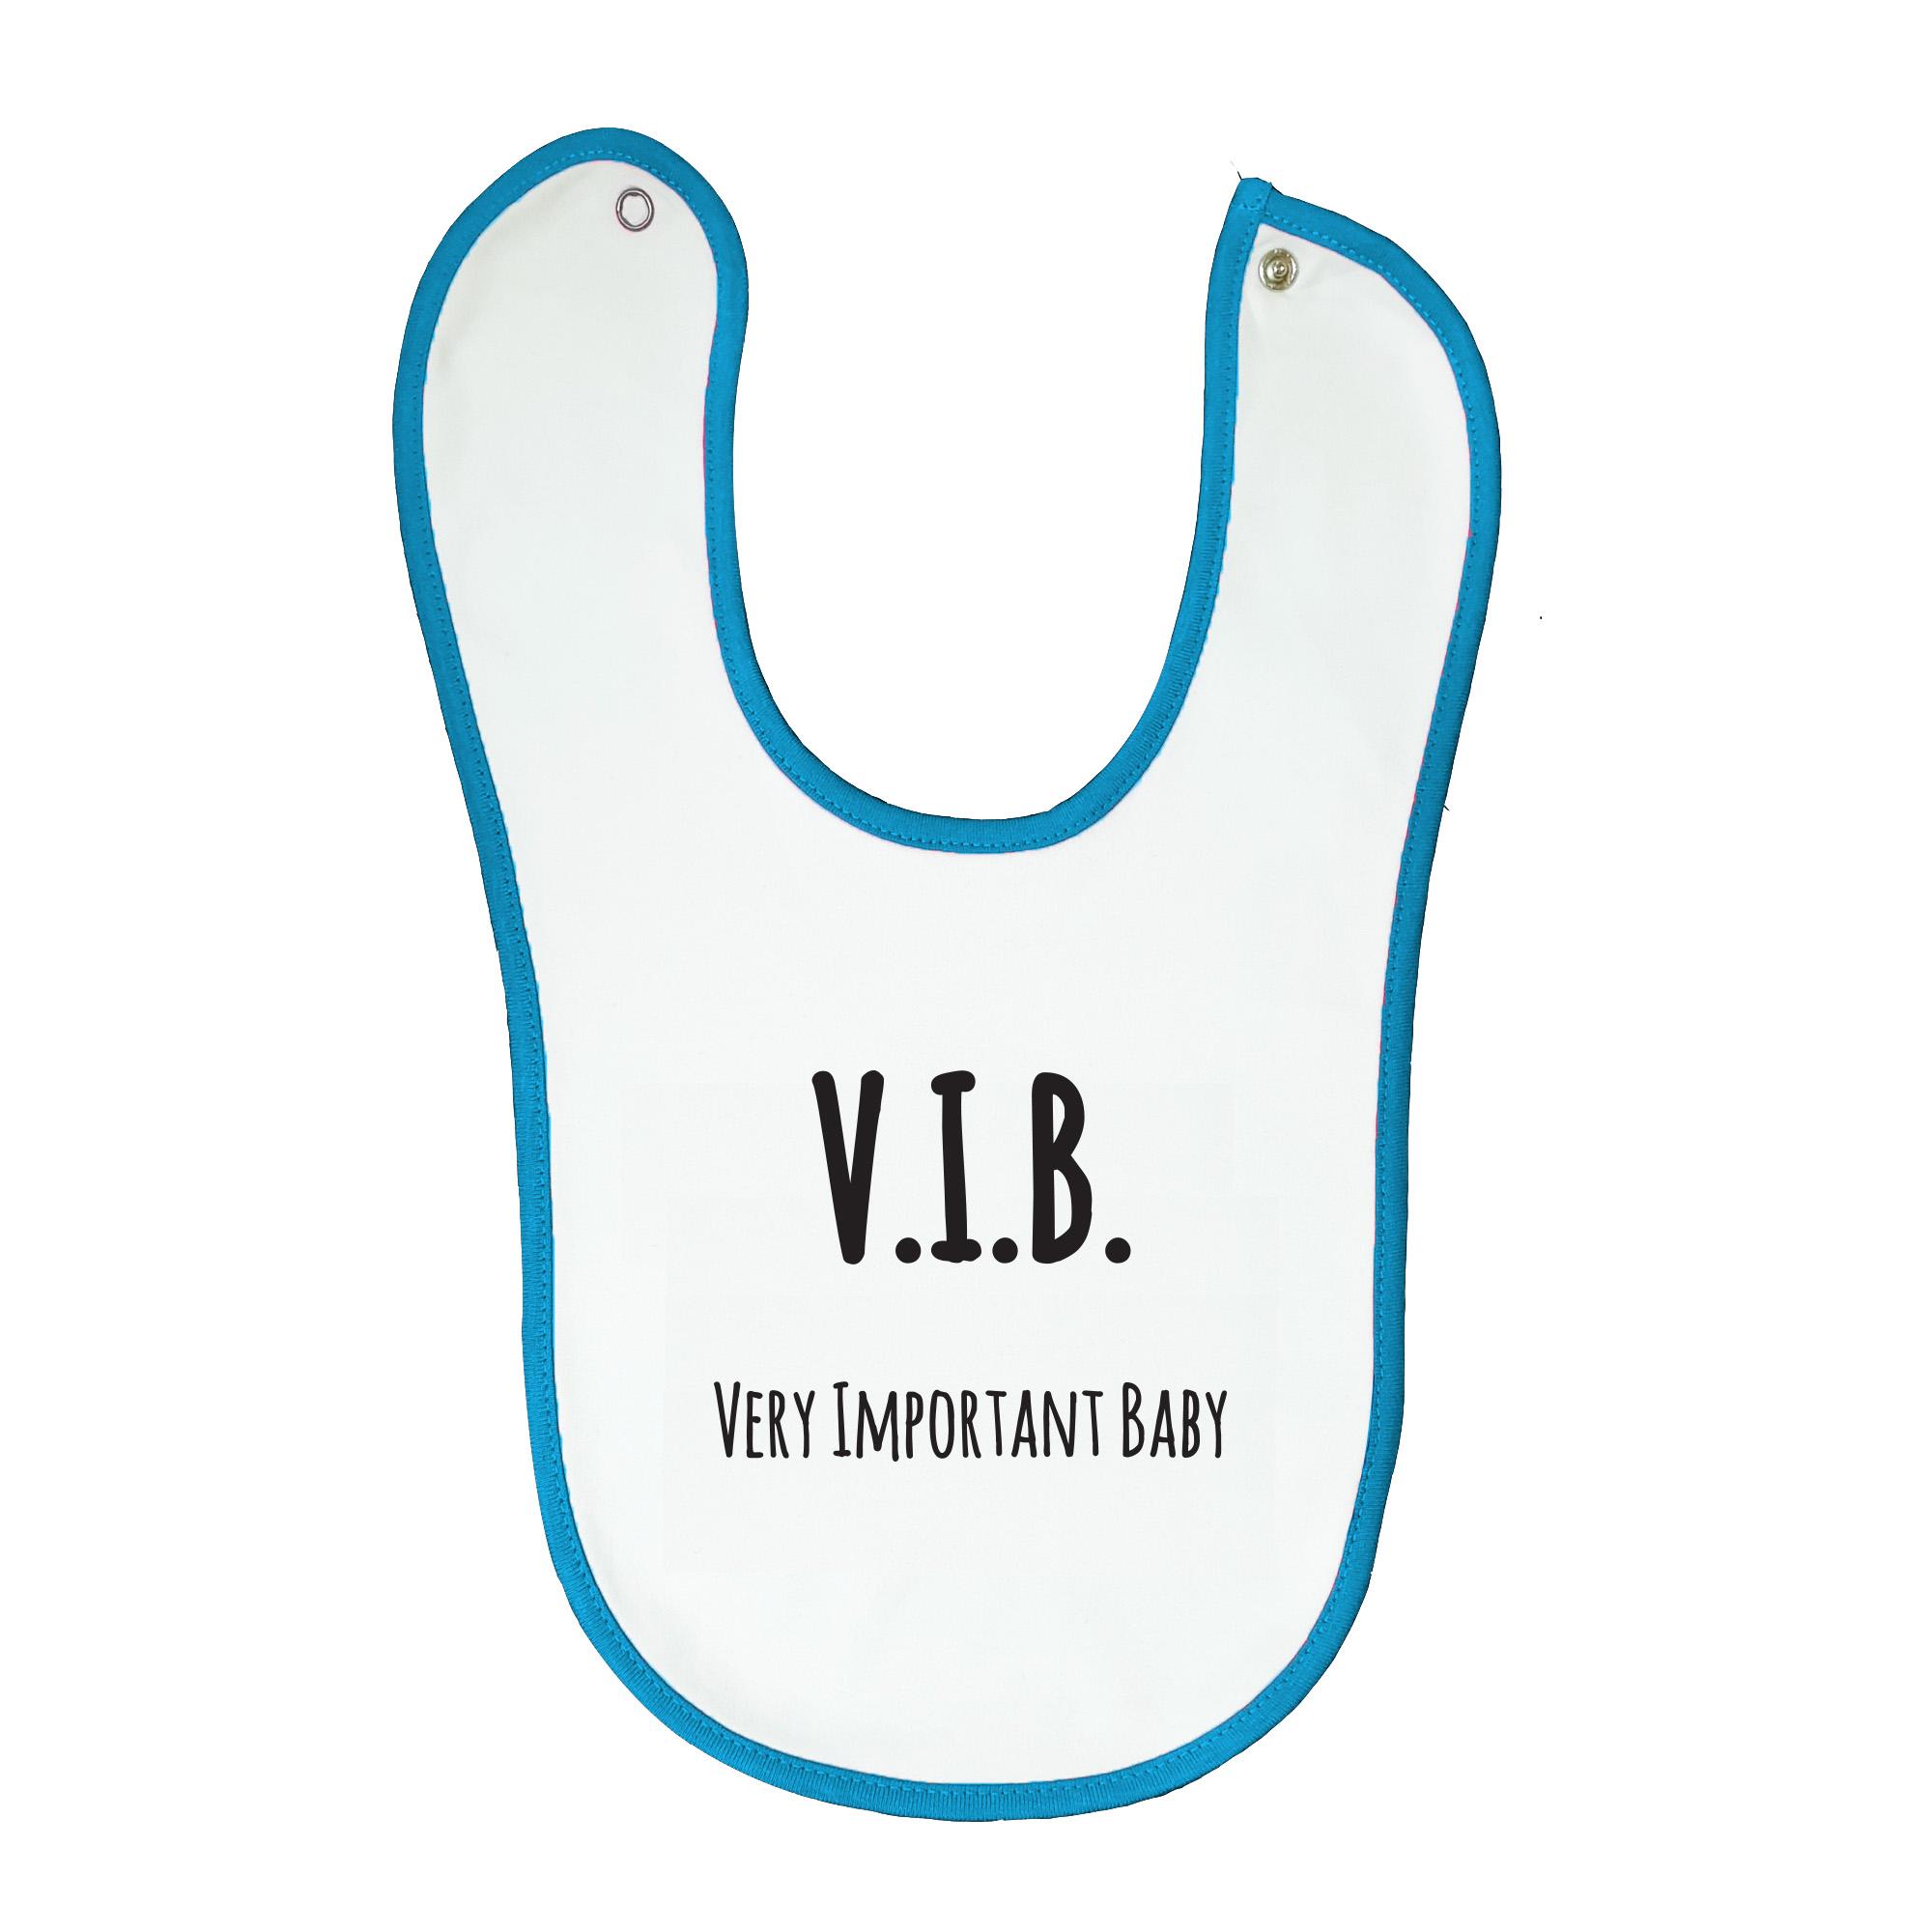 Soft baby bib, white with blue trim, 100% cotton machine washable. Age: 6-12 months. Print: V.I.B. Very Important Baby.